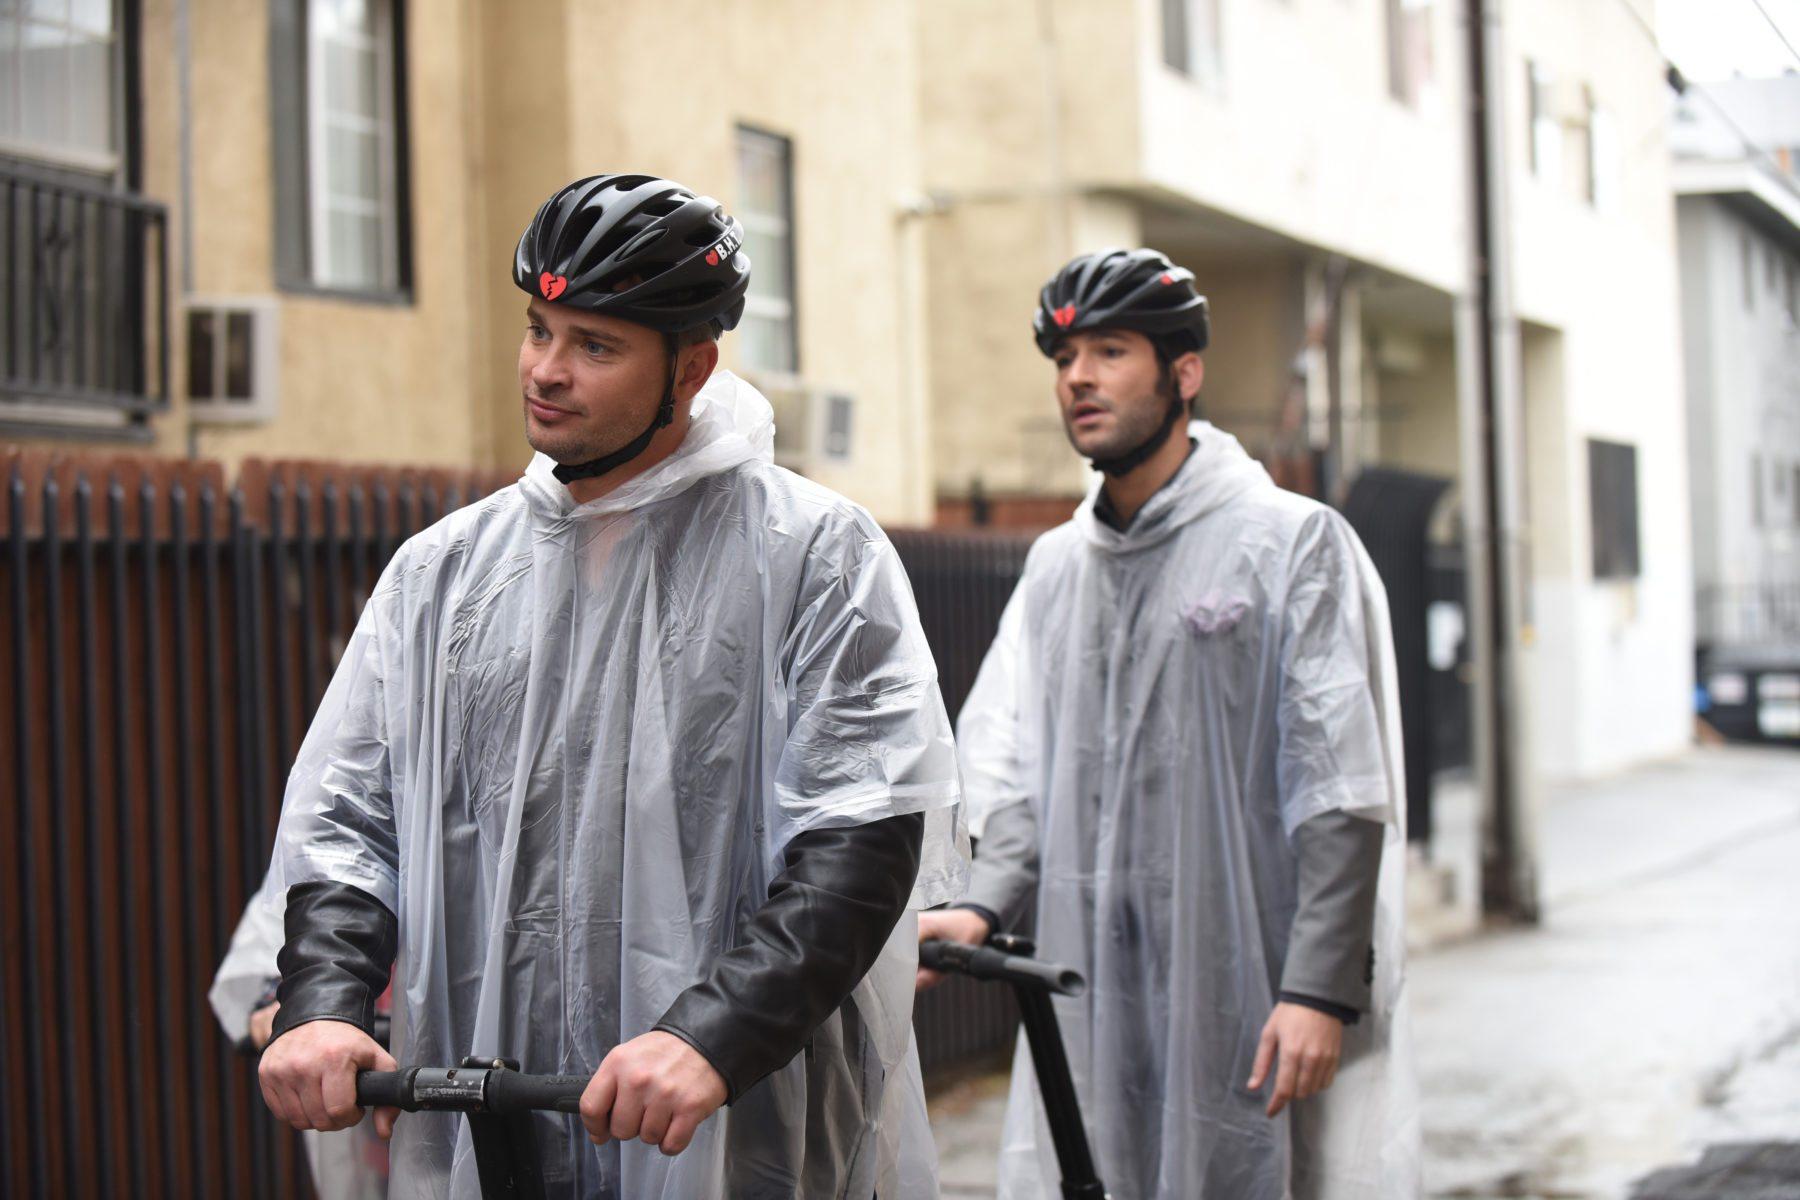 Lucifer Season 3 Episode 18 Review - 'The Last Heartbreak' | Flickering Myth